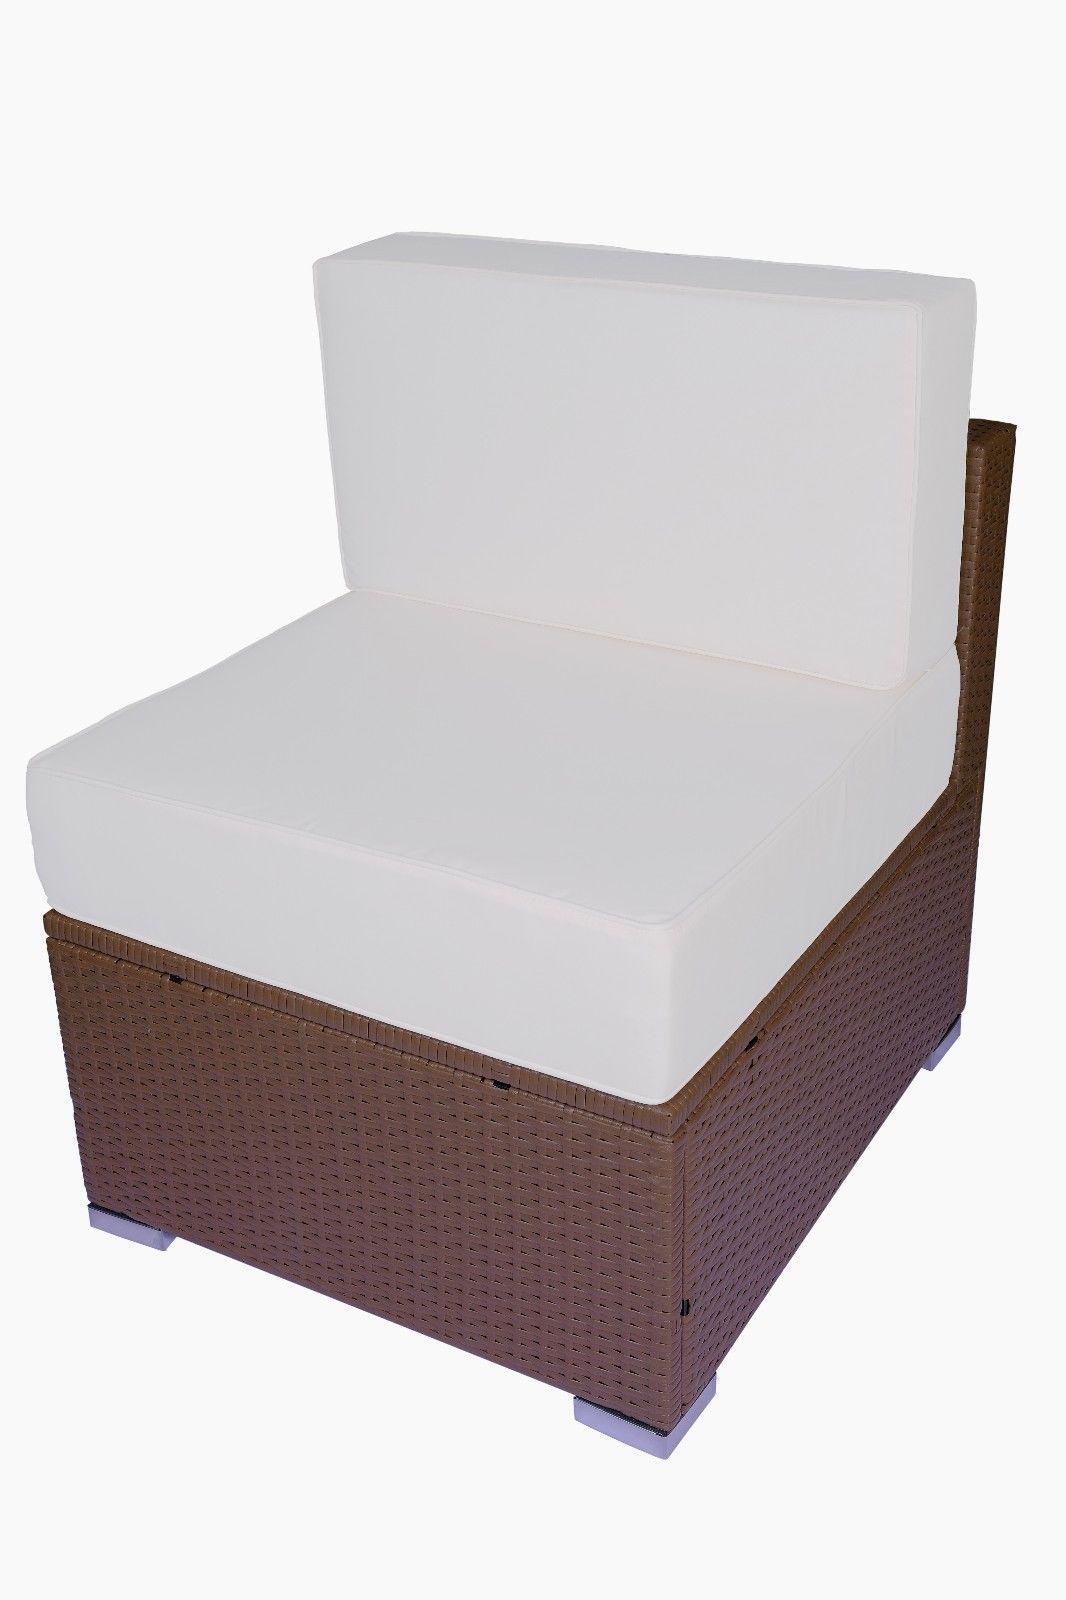 6 Chair Patio Set Cover: 13 PC Outdoor Wicker Chair Rattan Sofa Patio Furniture